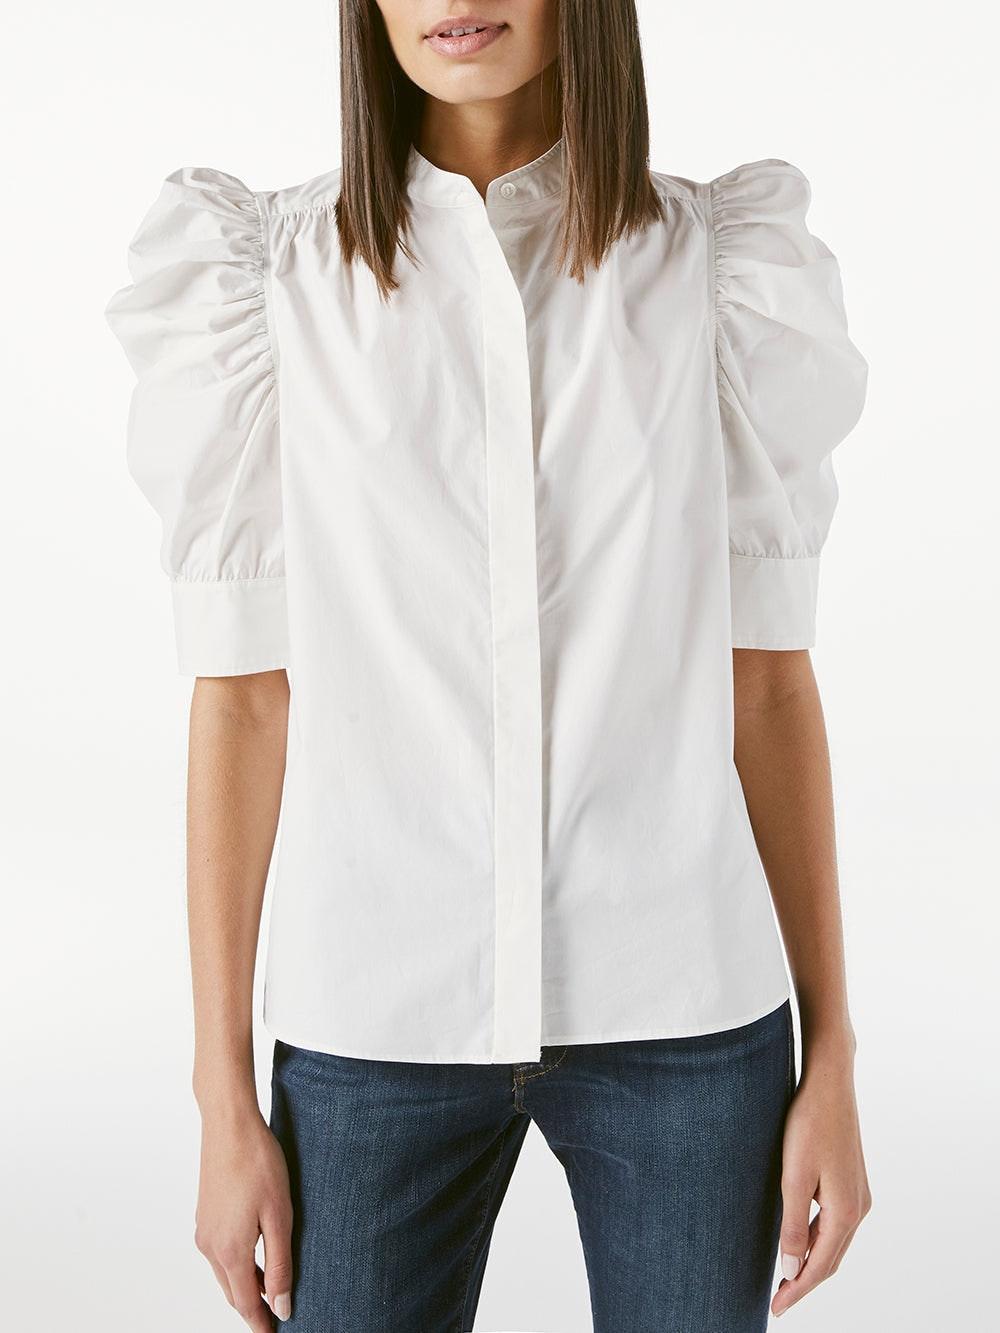 Gillian B Top -- Blanc